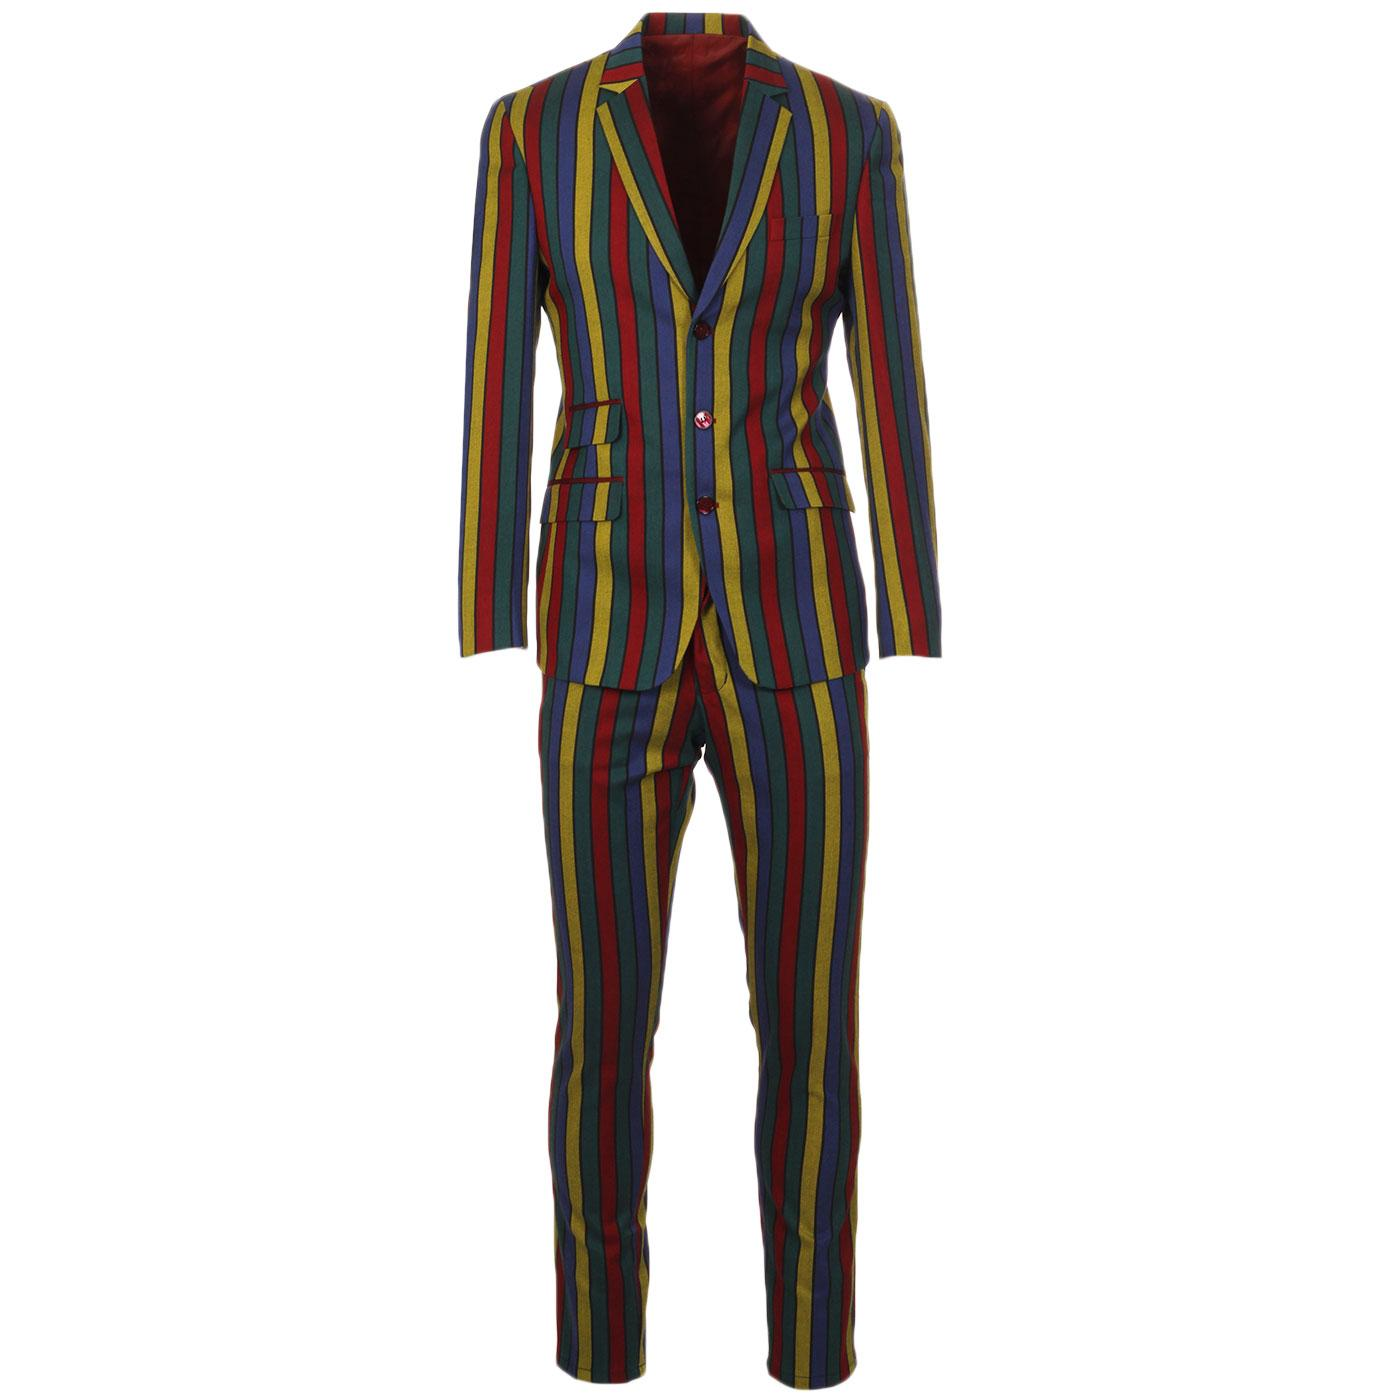 Madcap England Hendrix Stripe 60s Slim Mod Suit